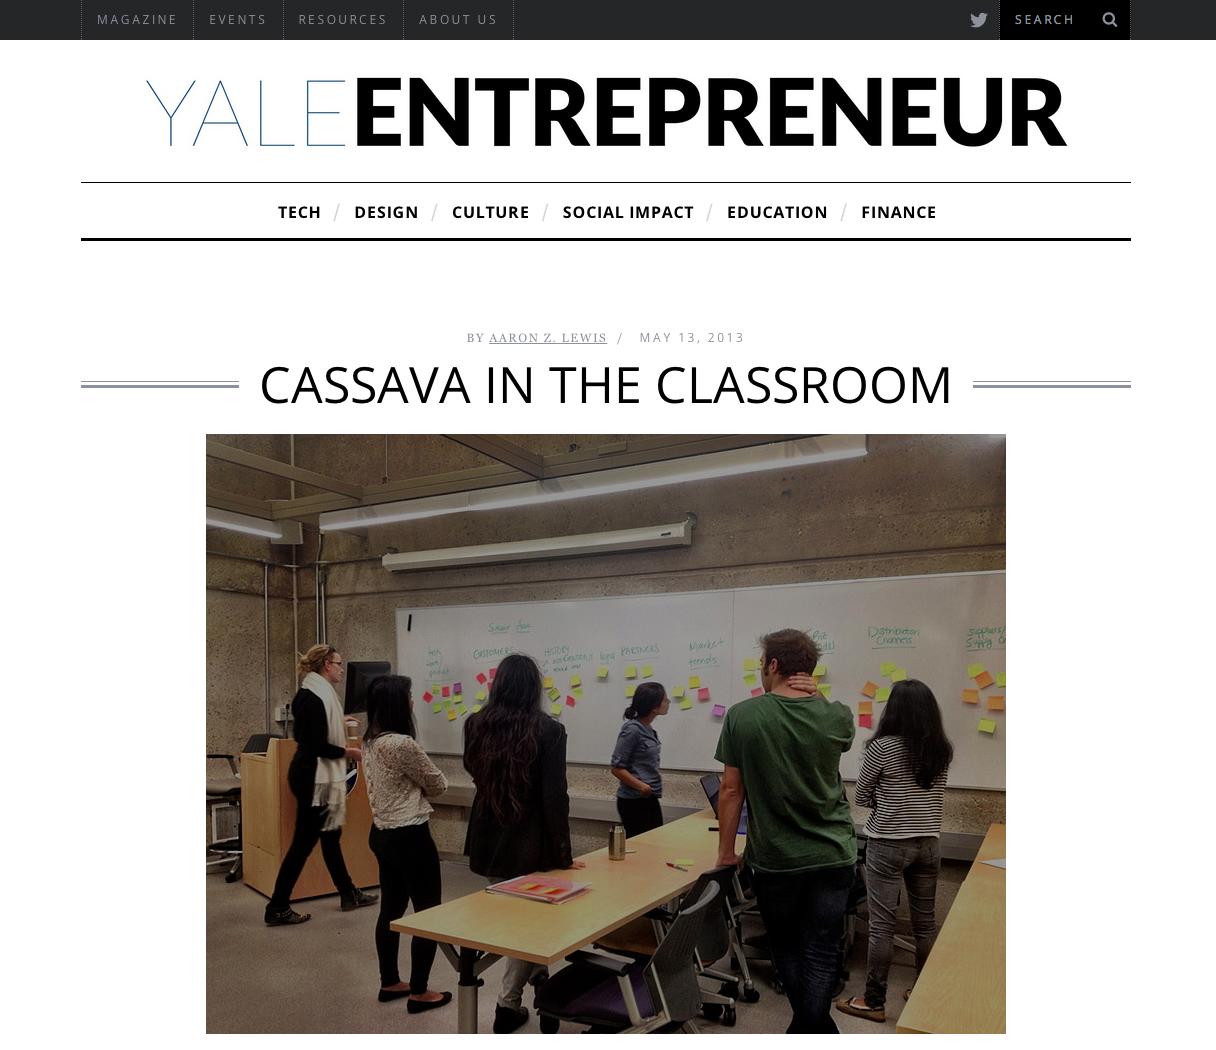 CASSAVA IN THE CLASSROOM